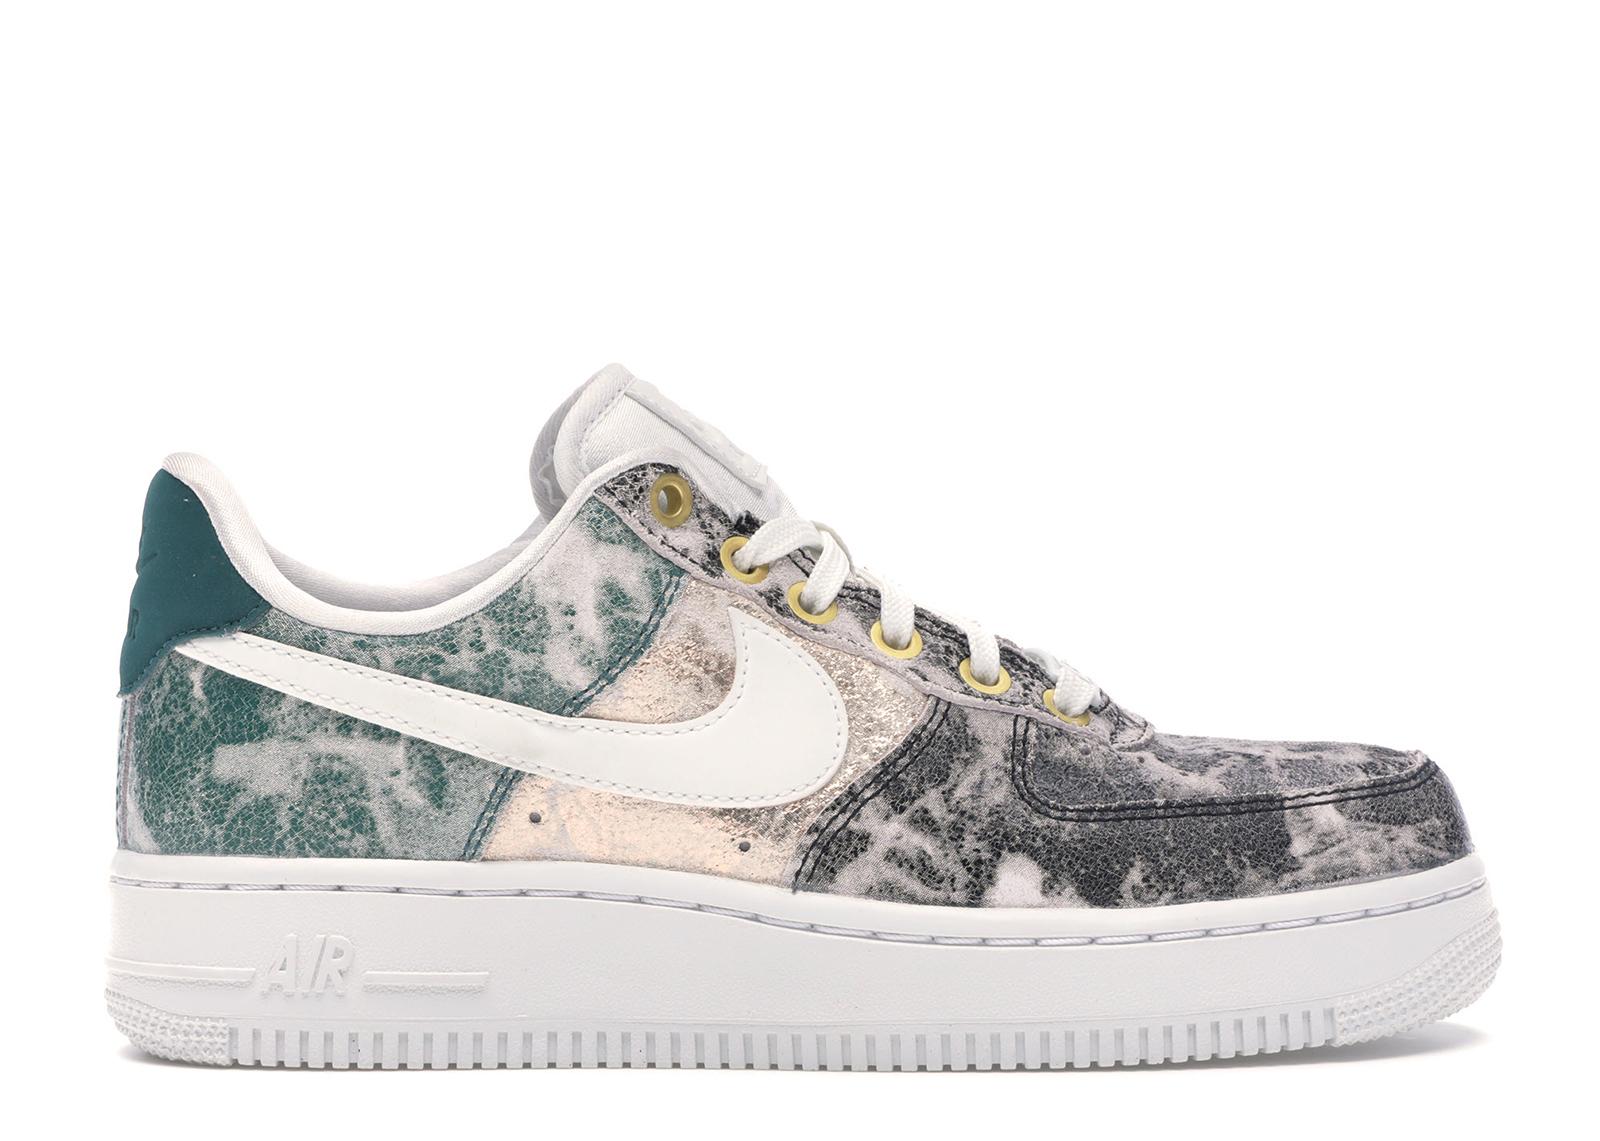 Nike Air Force 1 Low Metallic Leather (W)